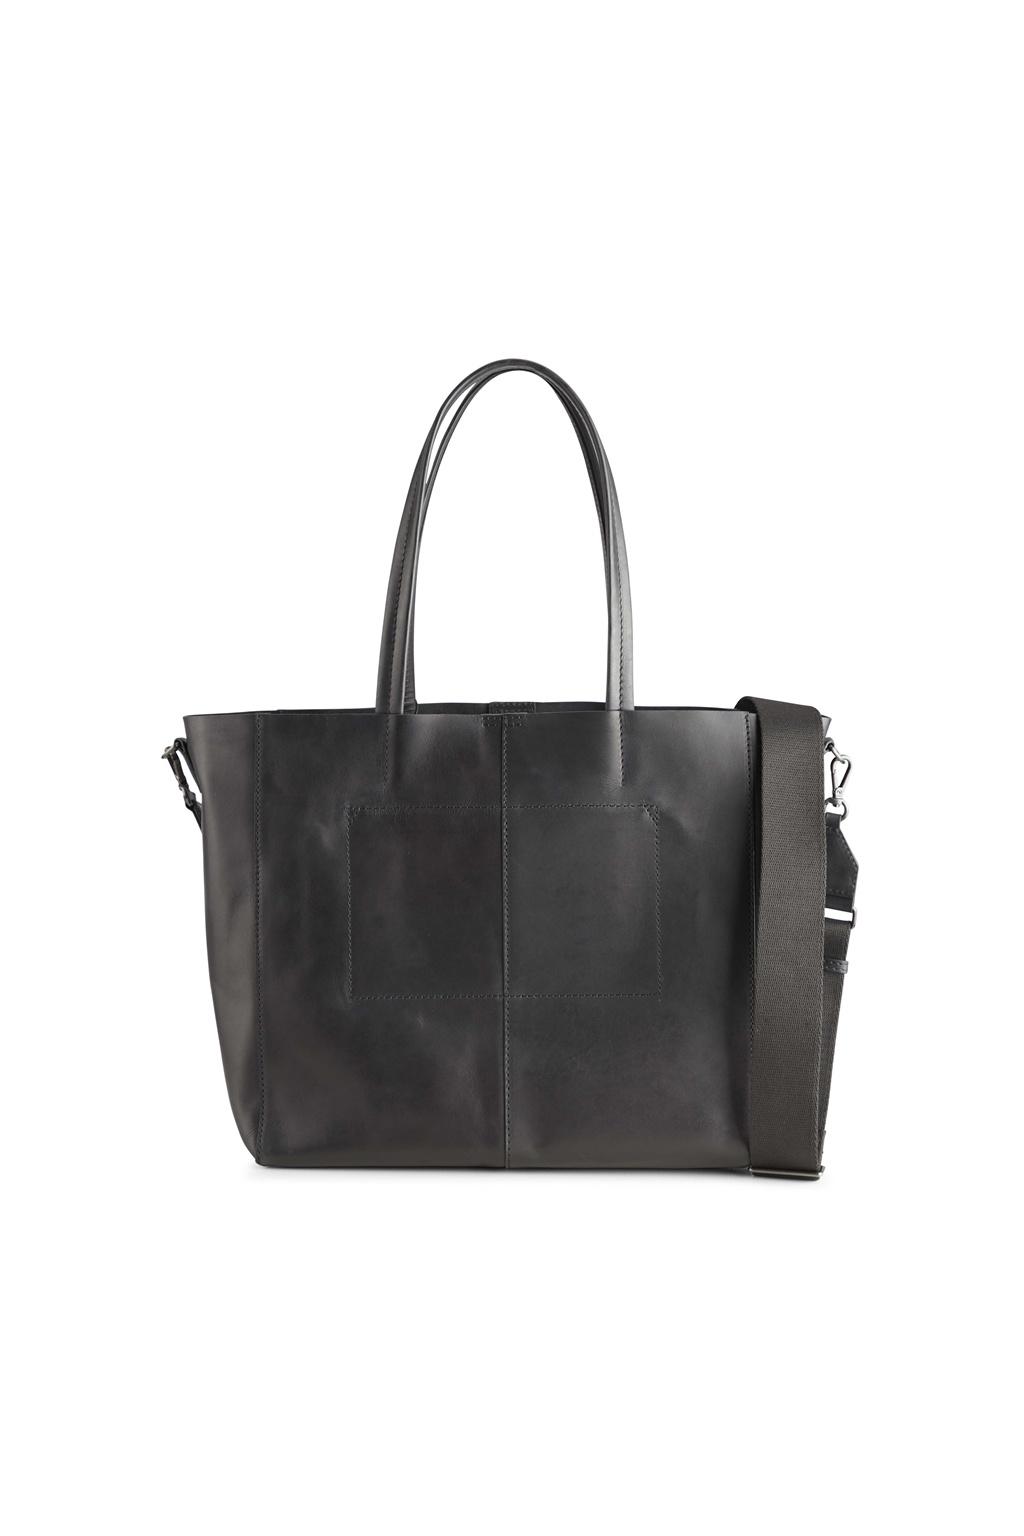 Reese Shopper Bag - Antique Black w/ Black-5